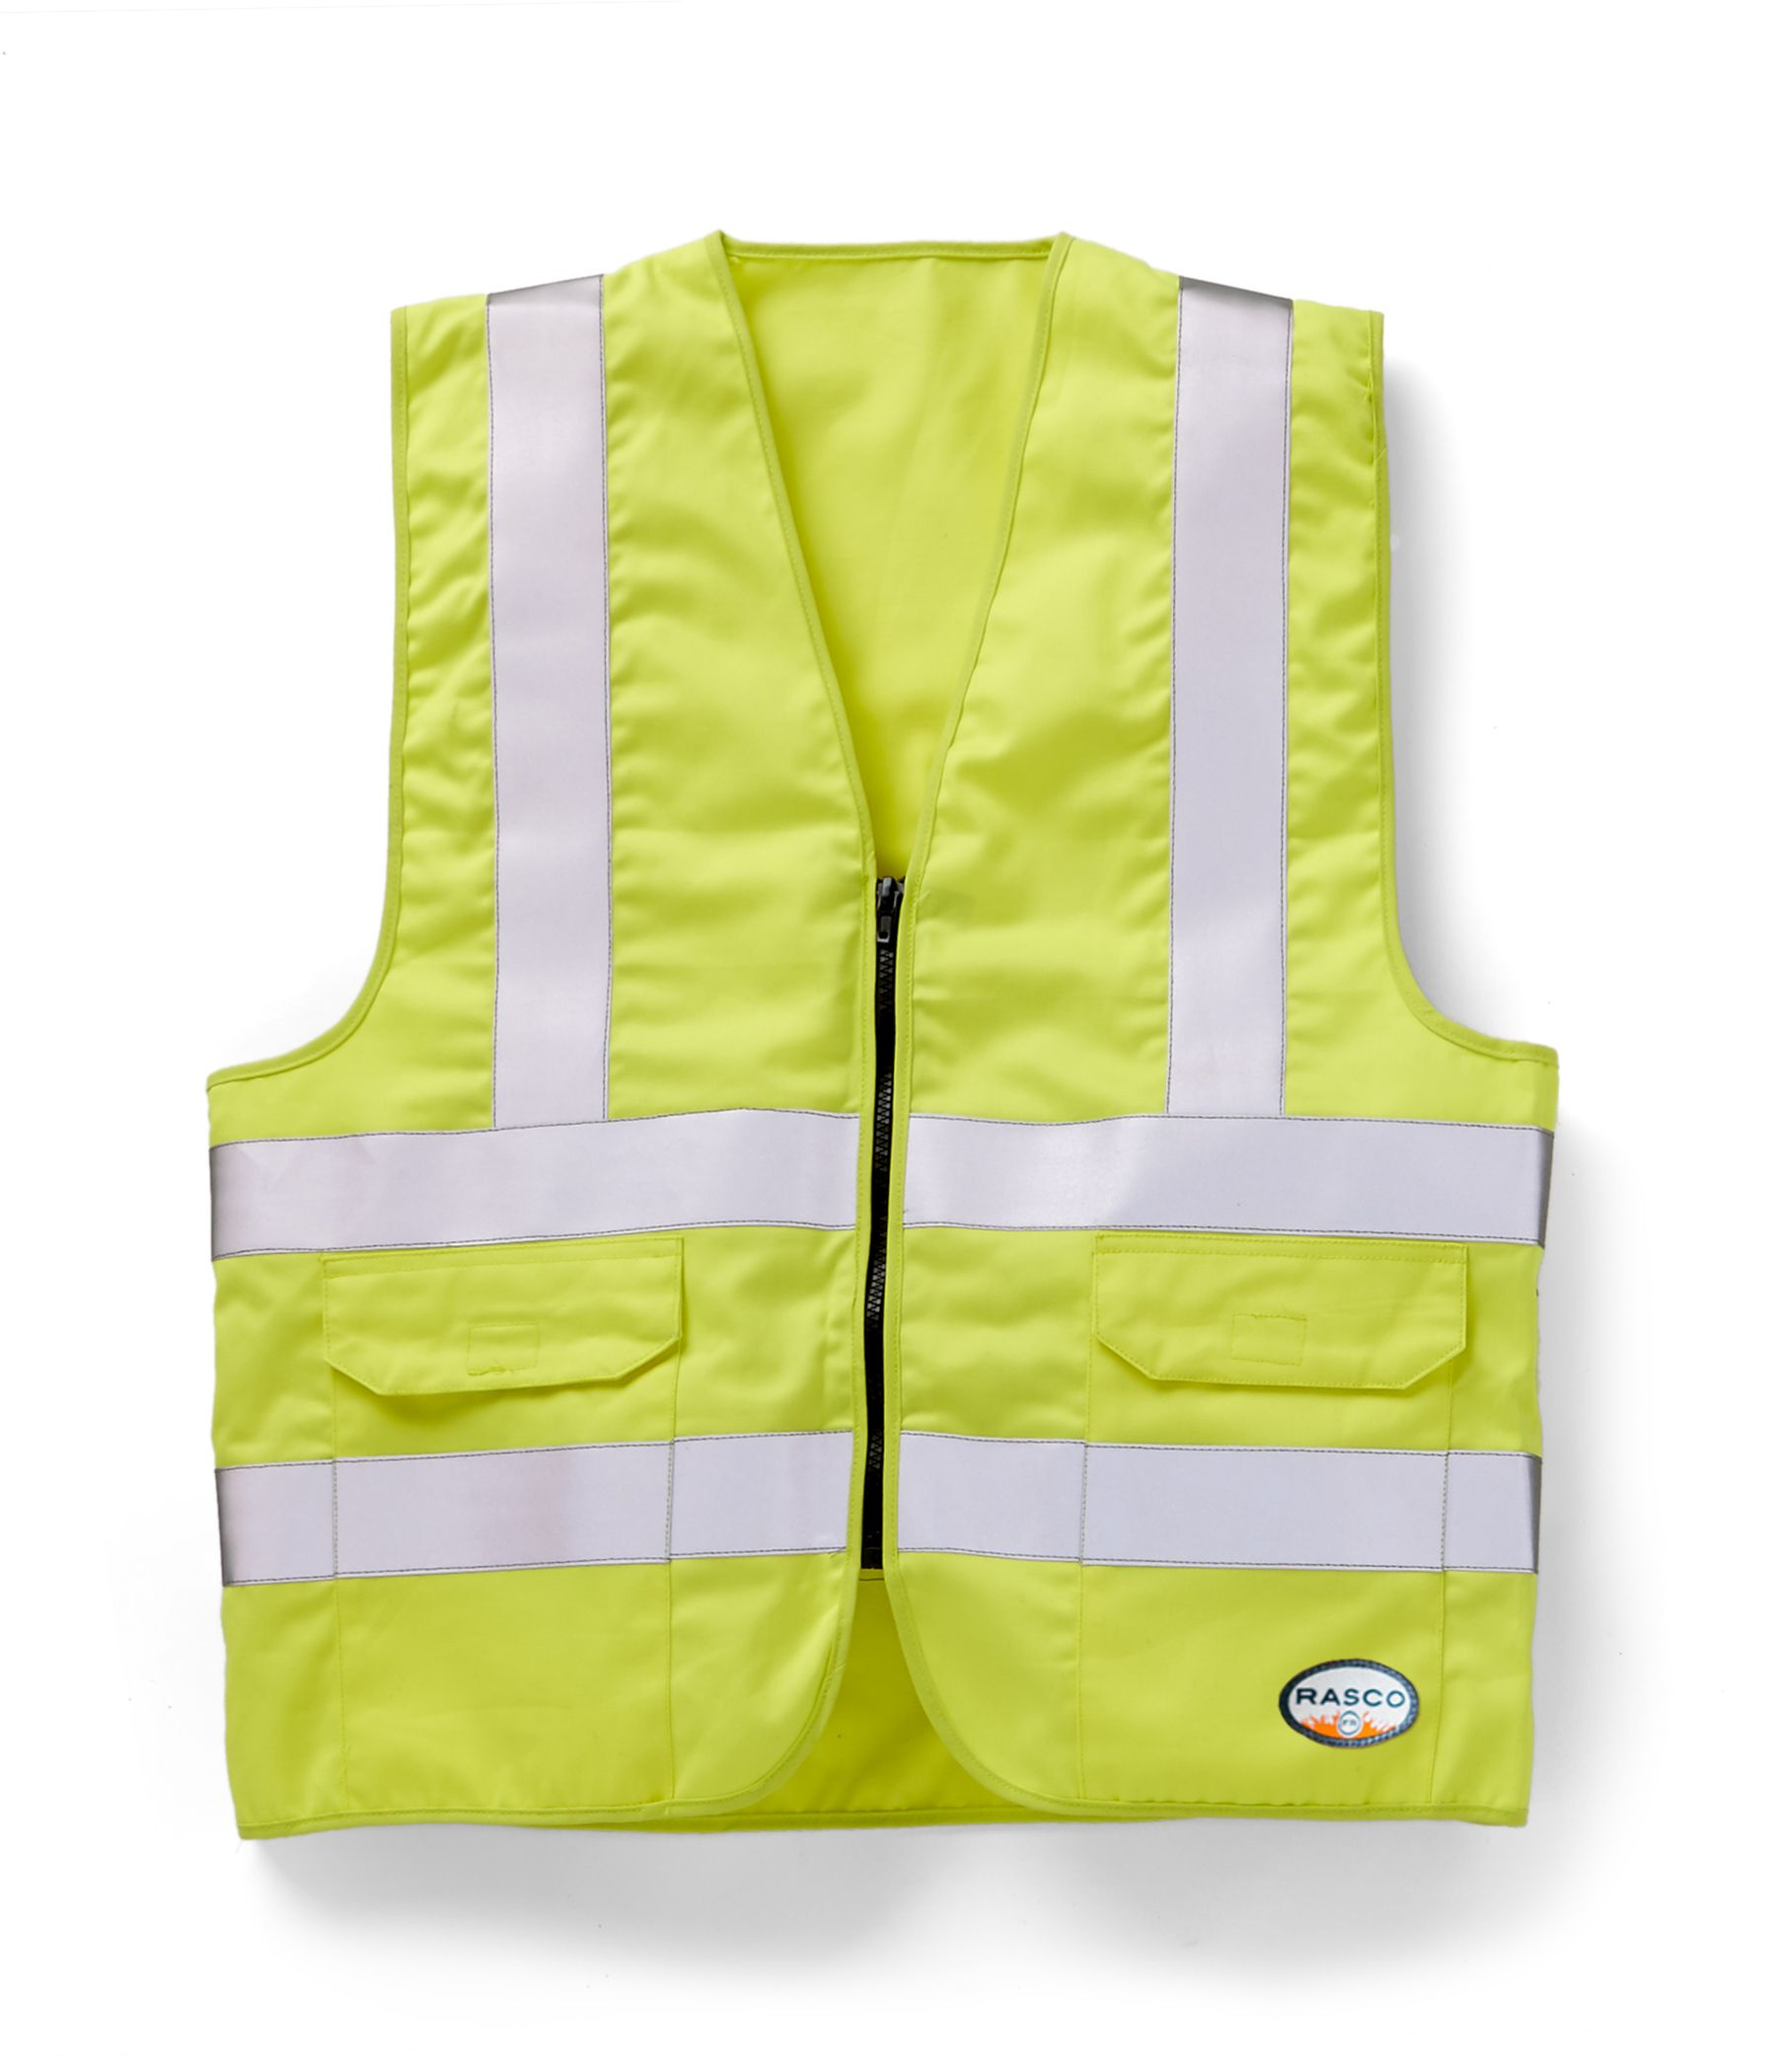 FR Hi Vis Yellow Vest W Pockets-